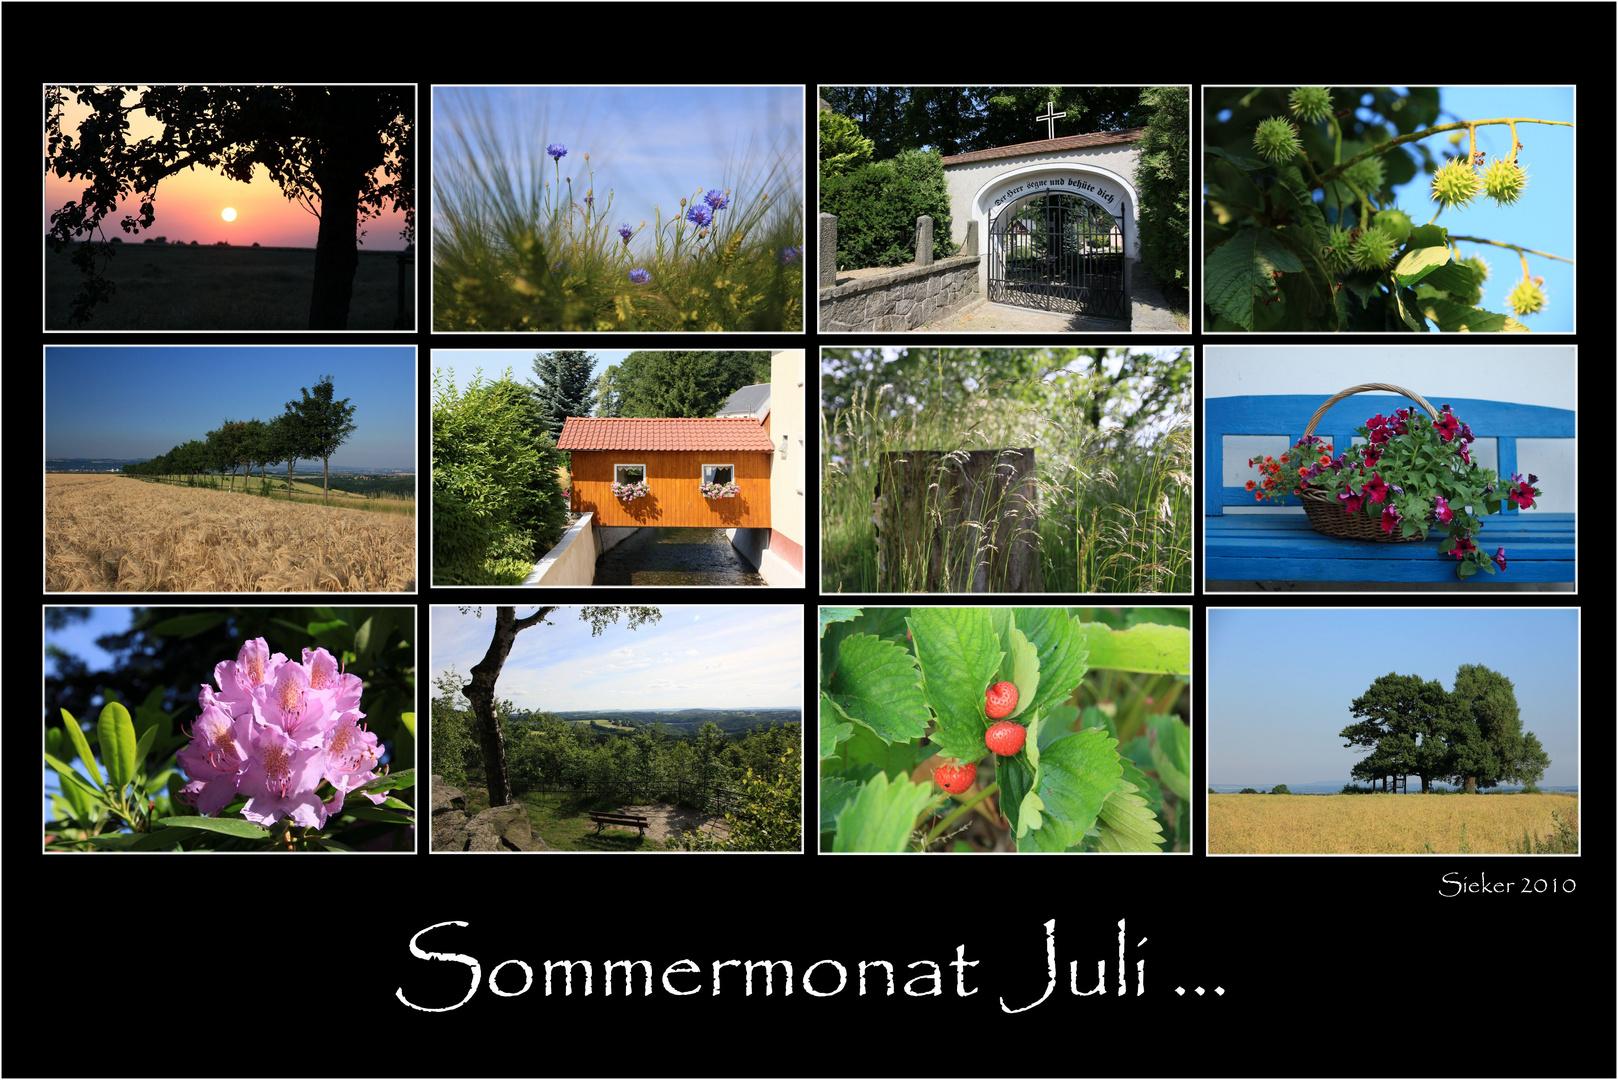 Sommermonat Juli ...